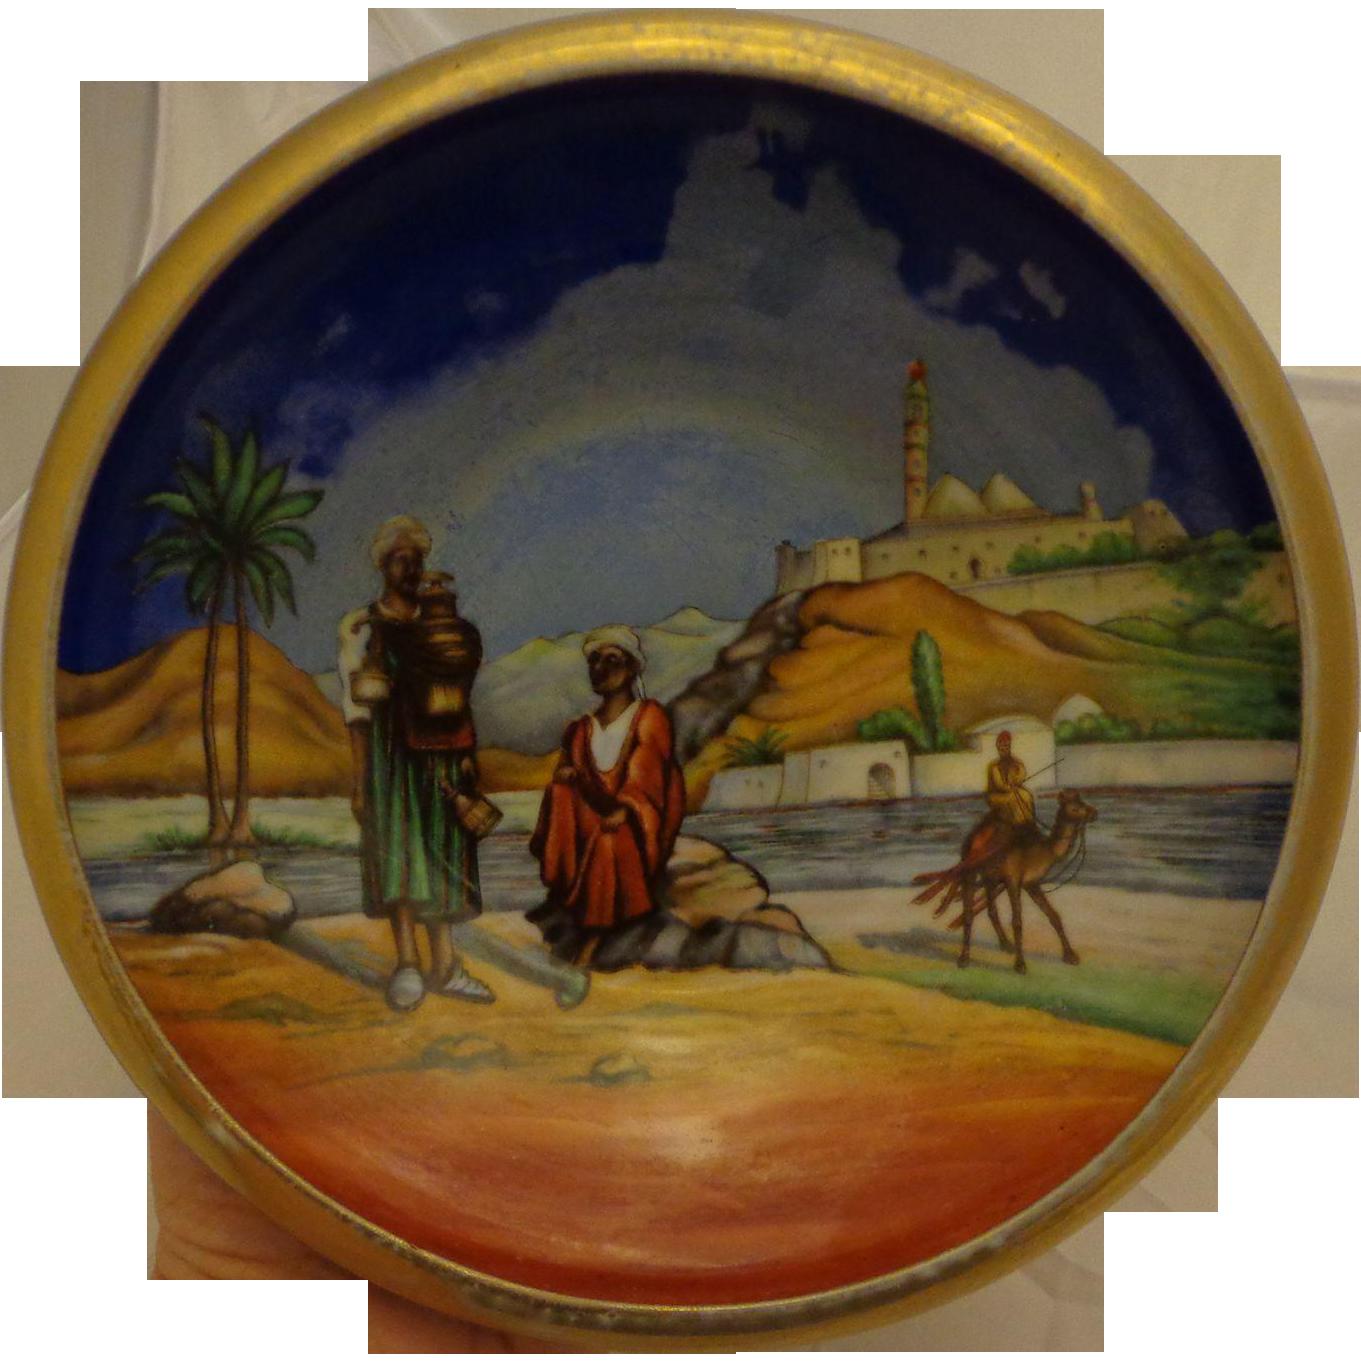 Shika Dragon Egyptian Bowl - Hookah Bowls at Hookah-Shisha.com |Egyption Bowls